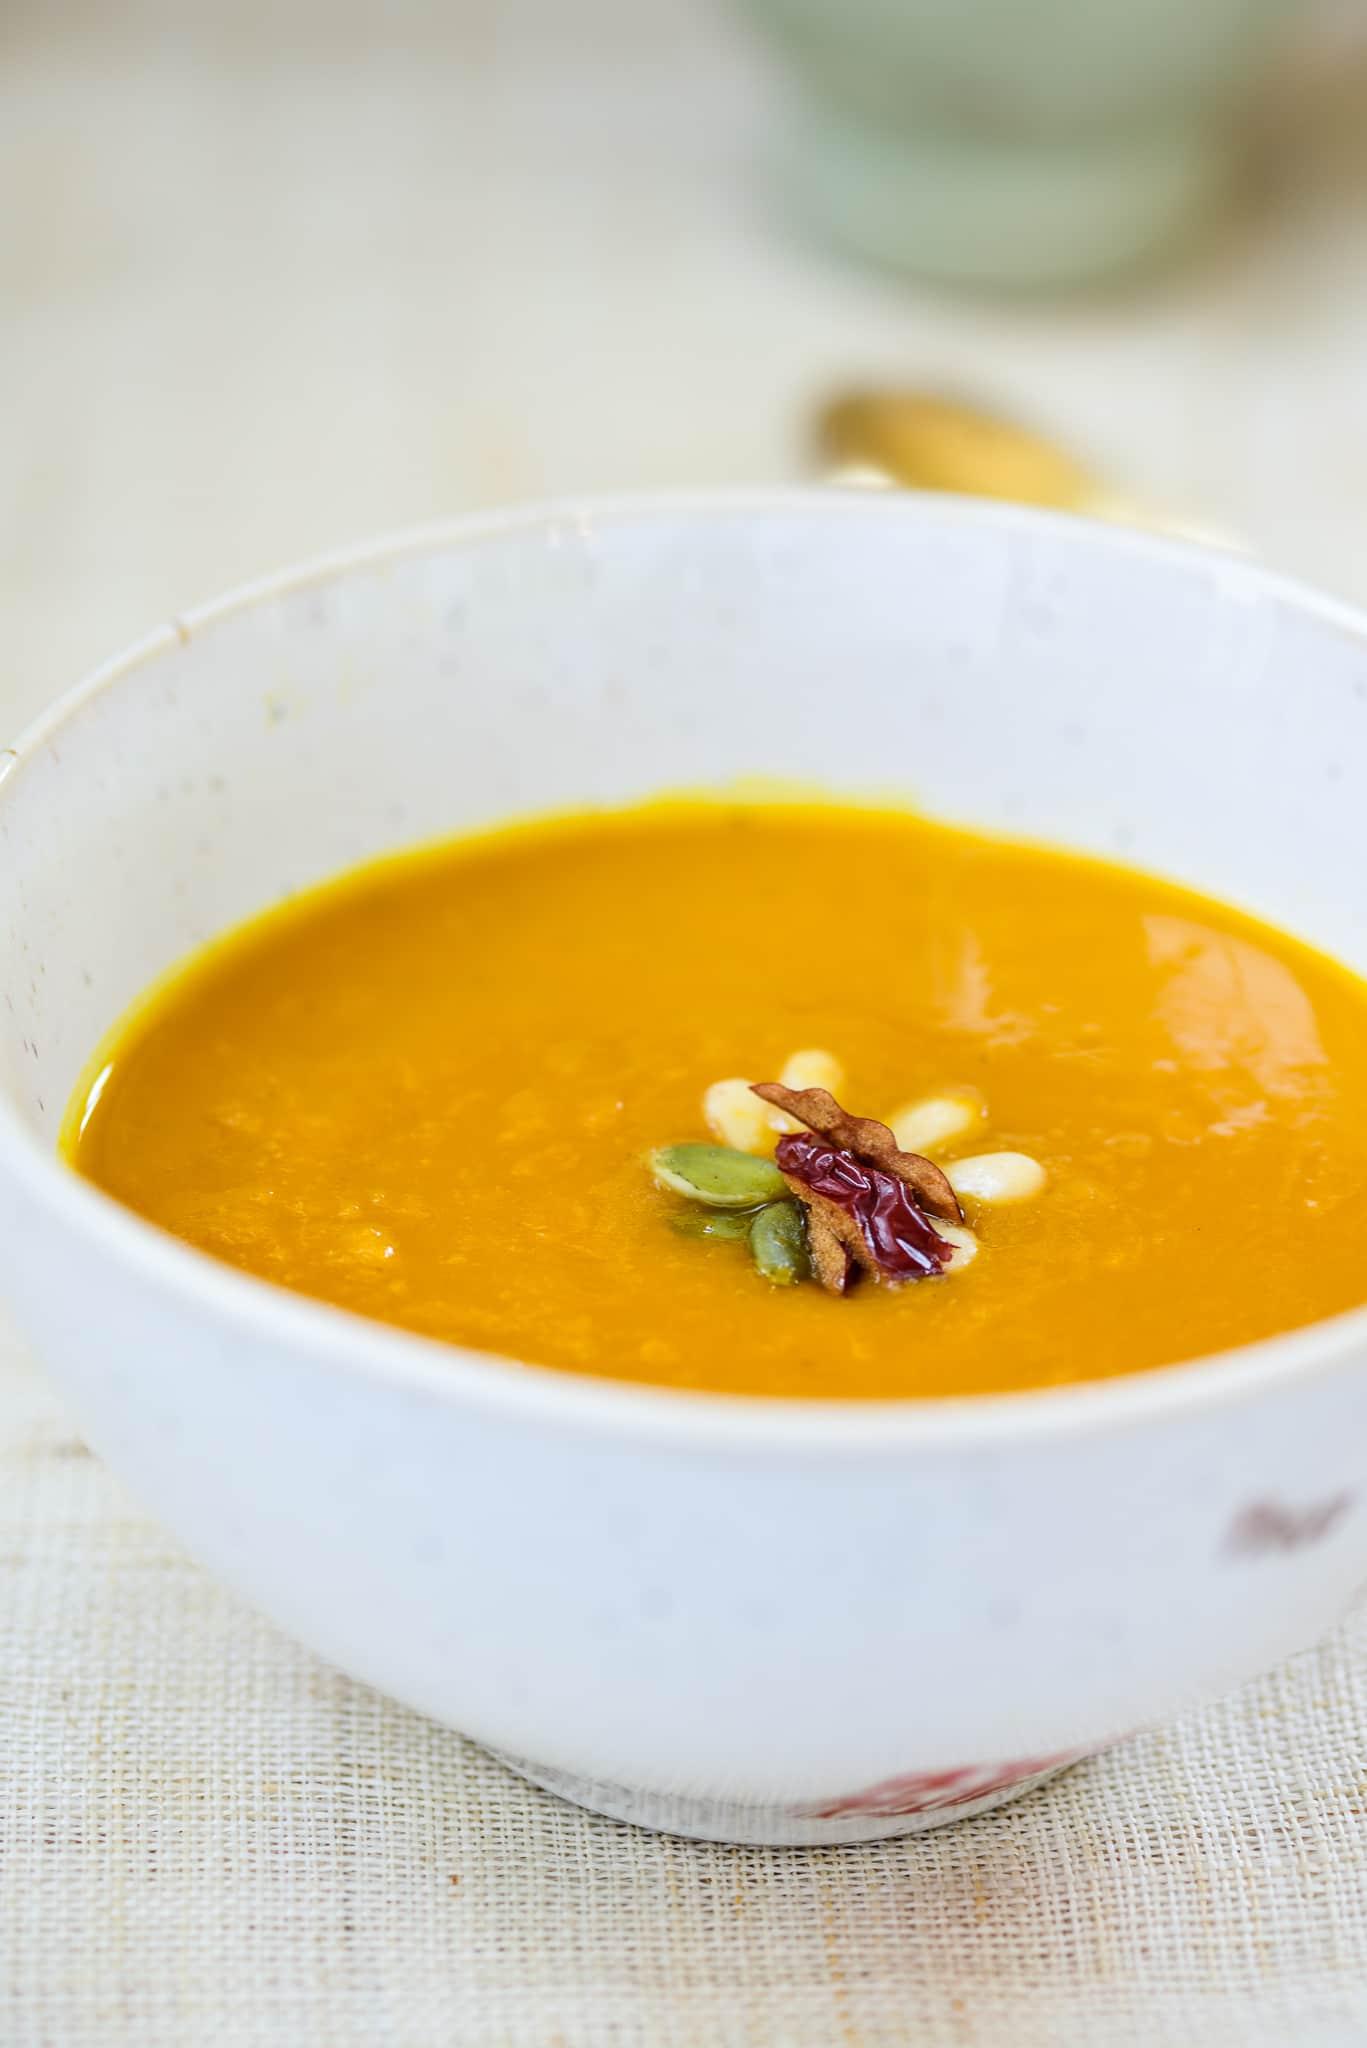 DSC4547 3 - Hobakjuk (Pumpkin Porridge)